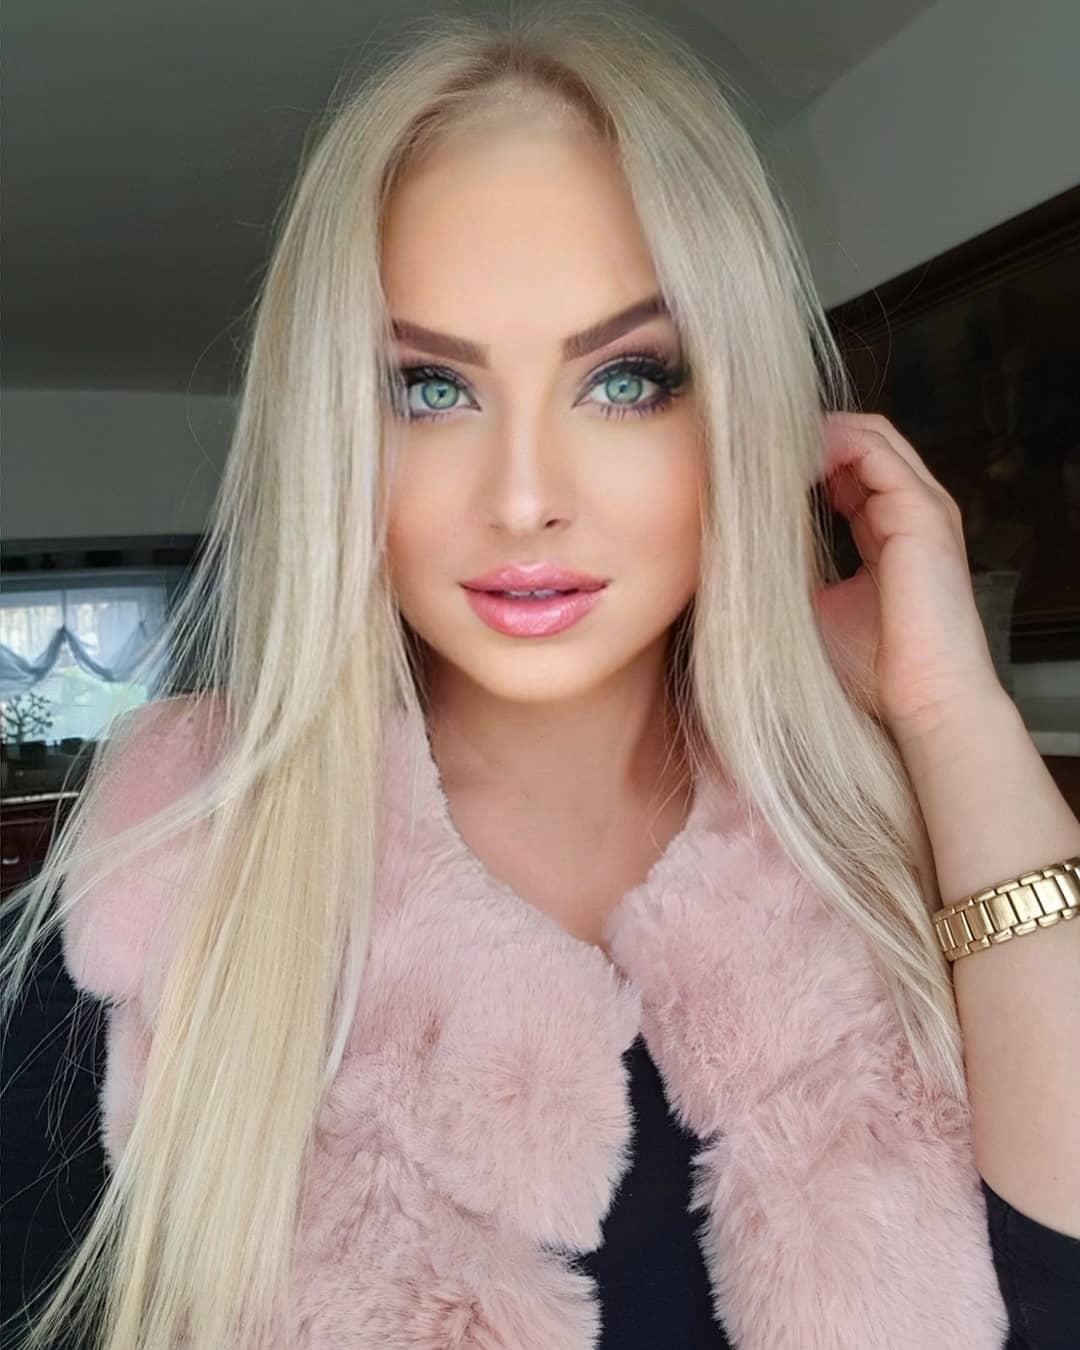 Veronica-Hunkova-Wallpapers-Insta-Fit-Bio-14